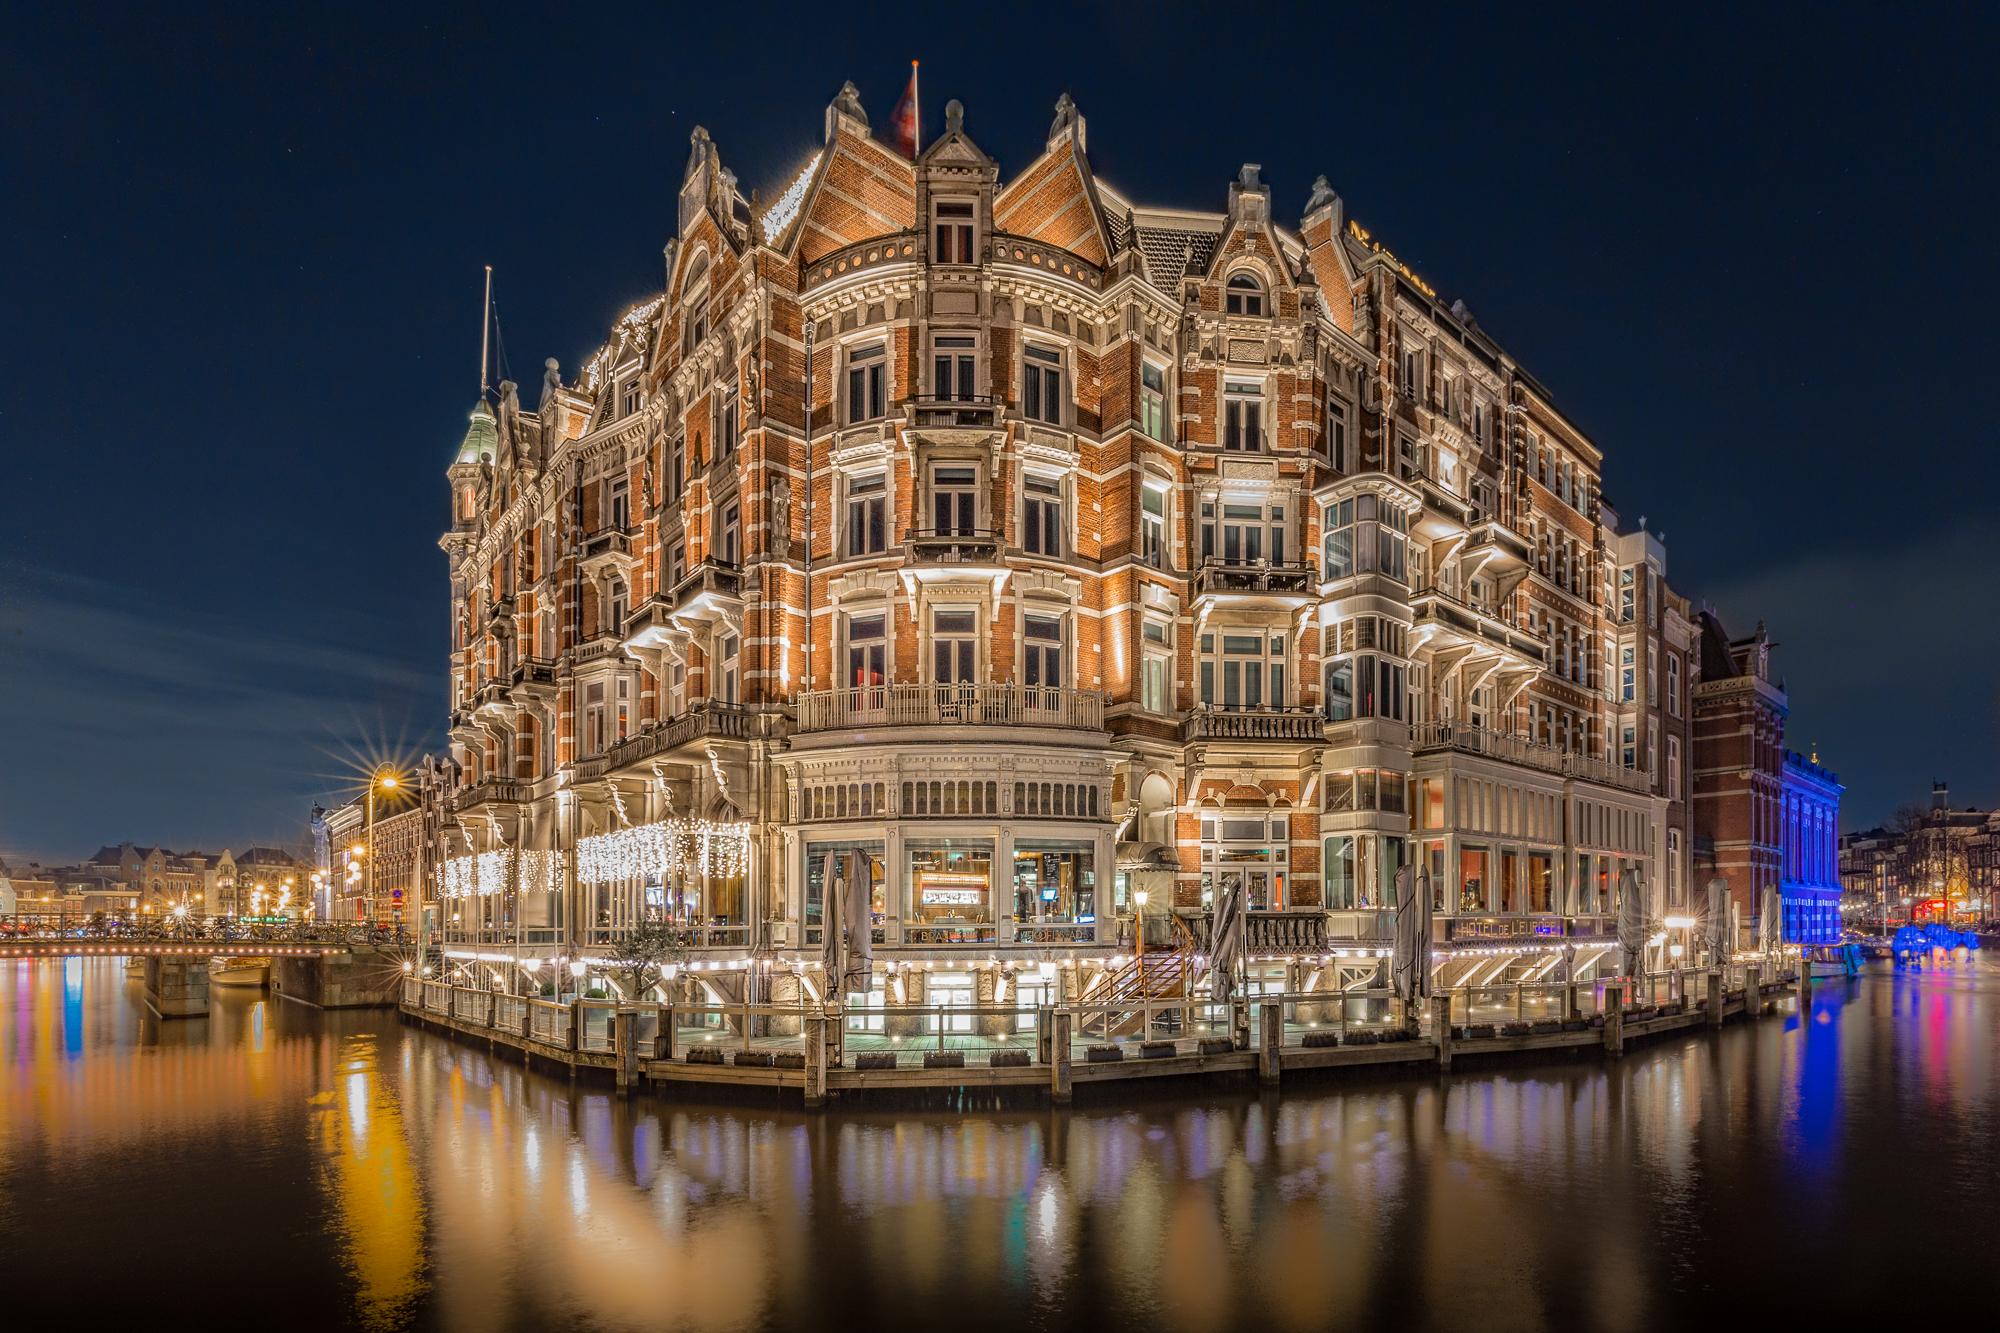 De L'Europe Hotel, Amsterdam [2000x1333]